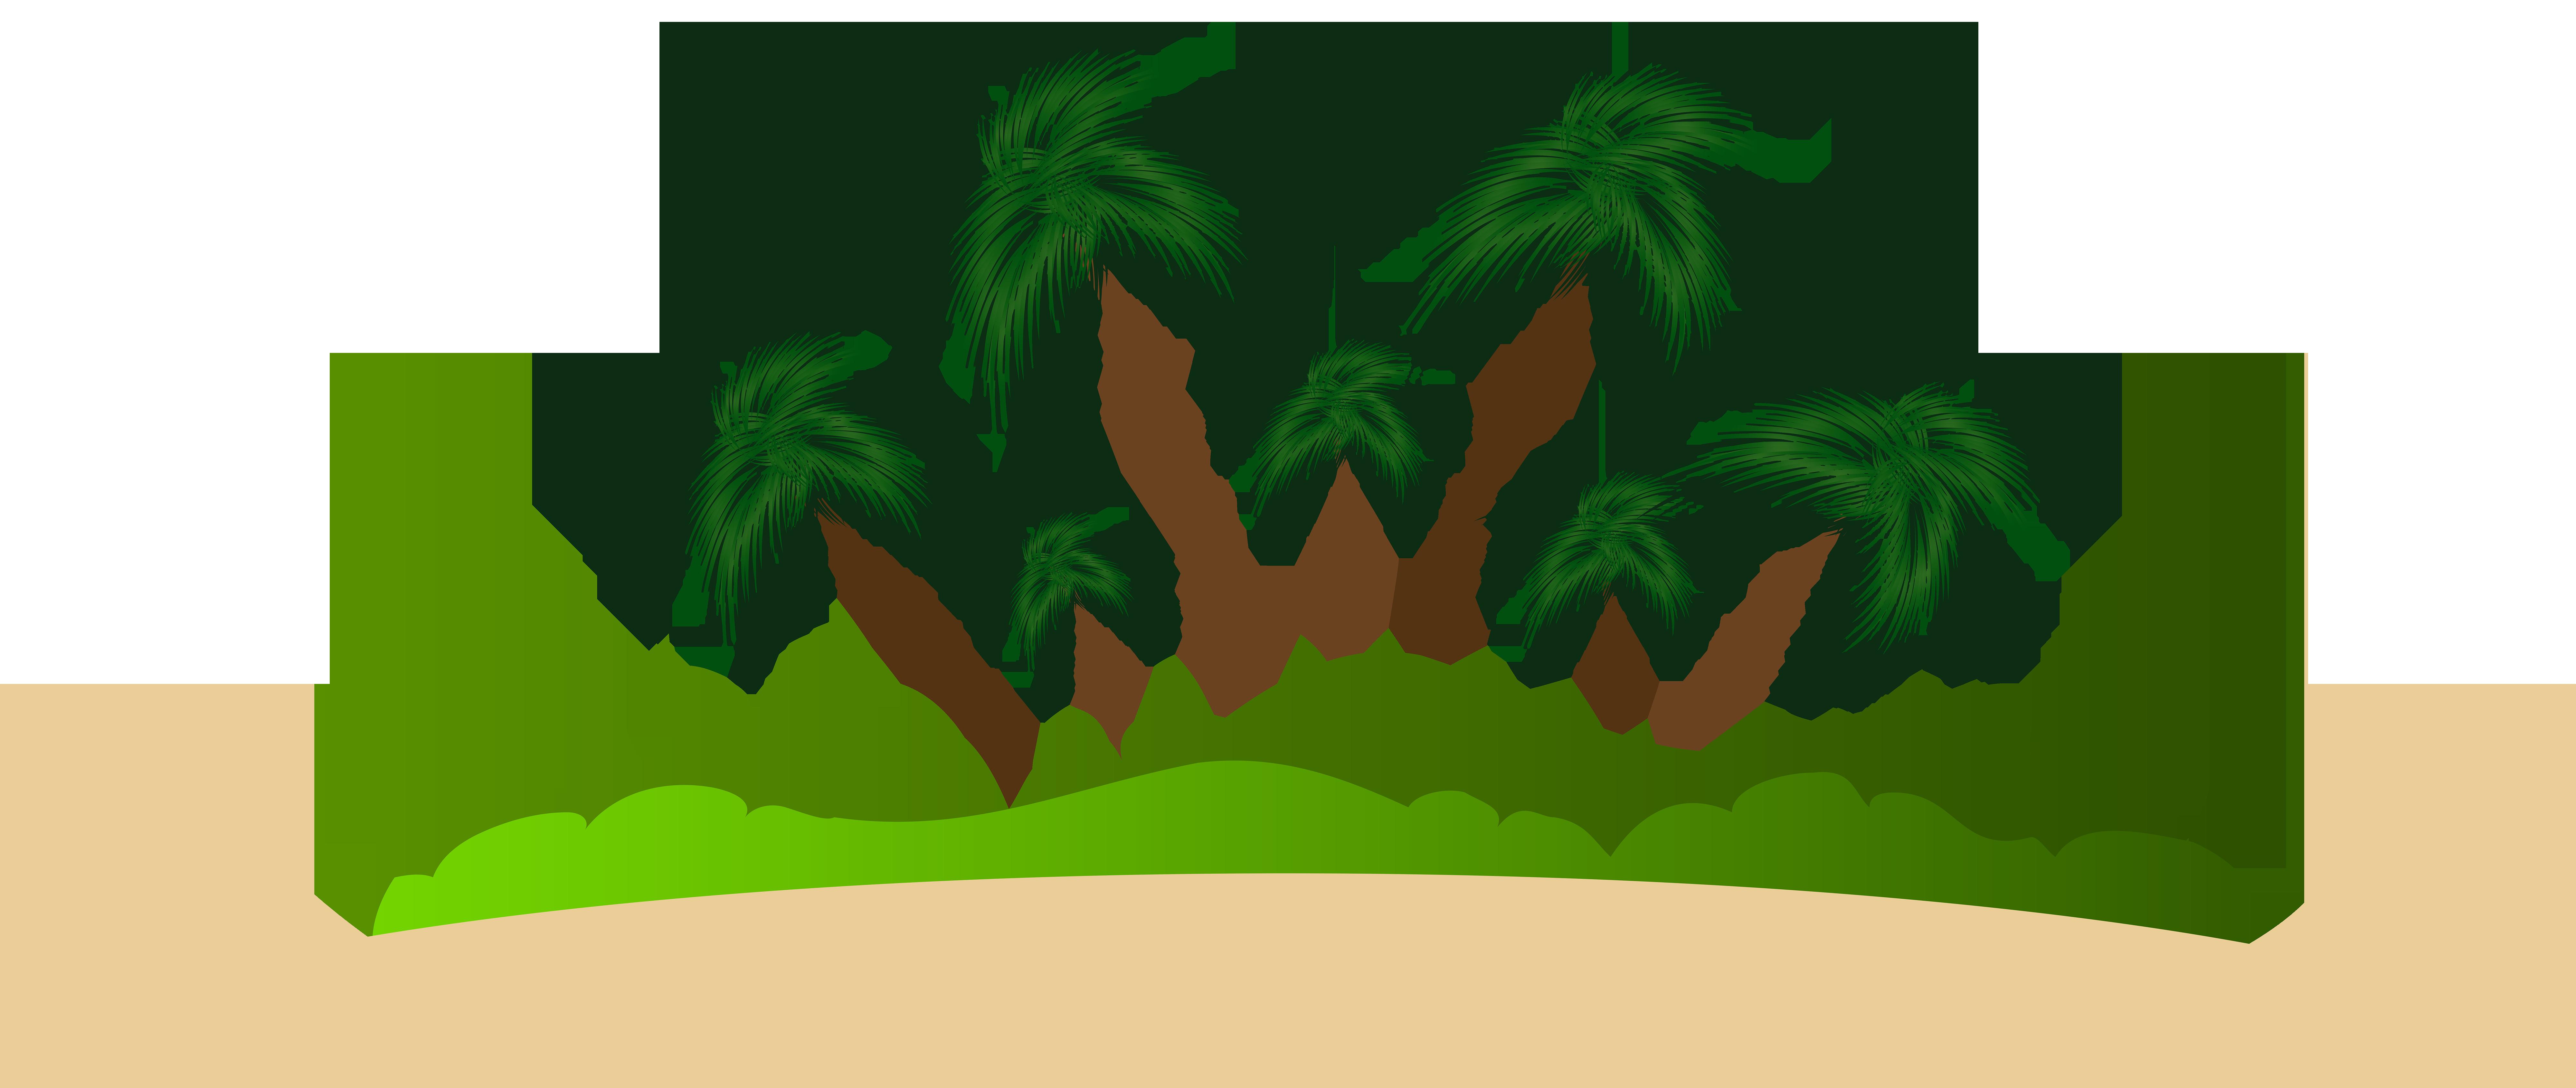 Island Clip Art - Getbellhop. View full size ?